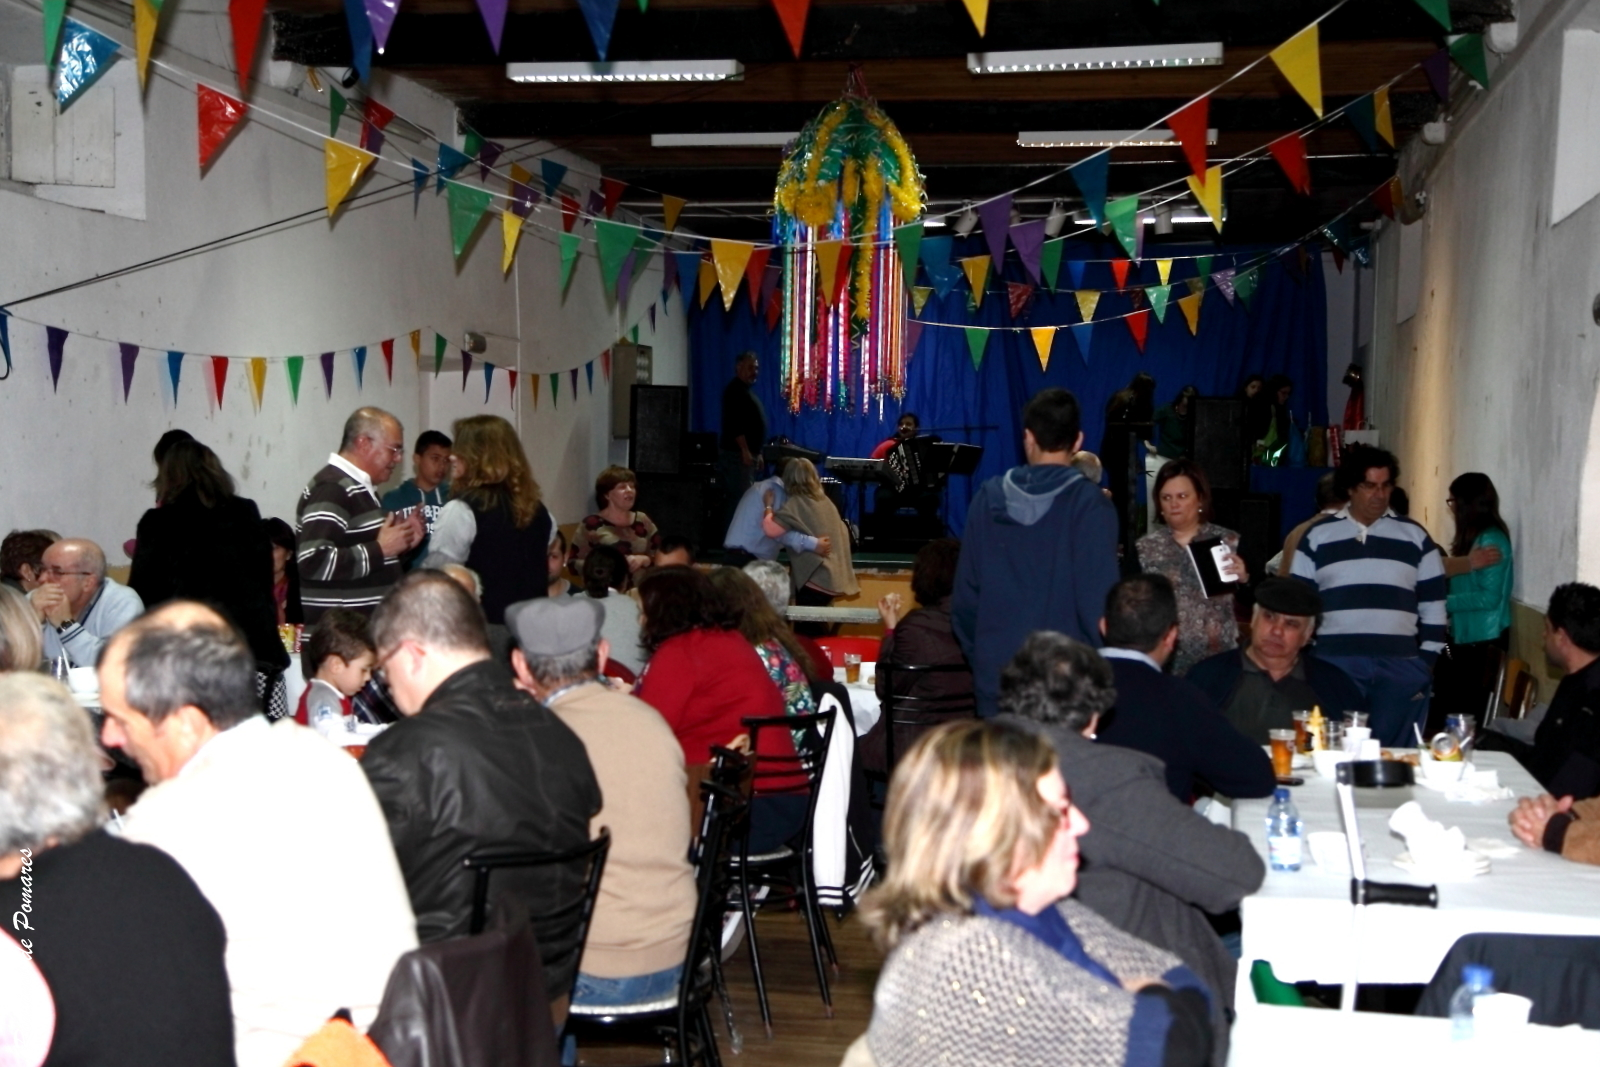 Baile da Pinha -2015 - Soito da Ruiva (004)